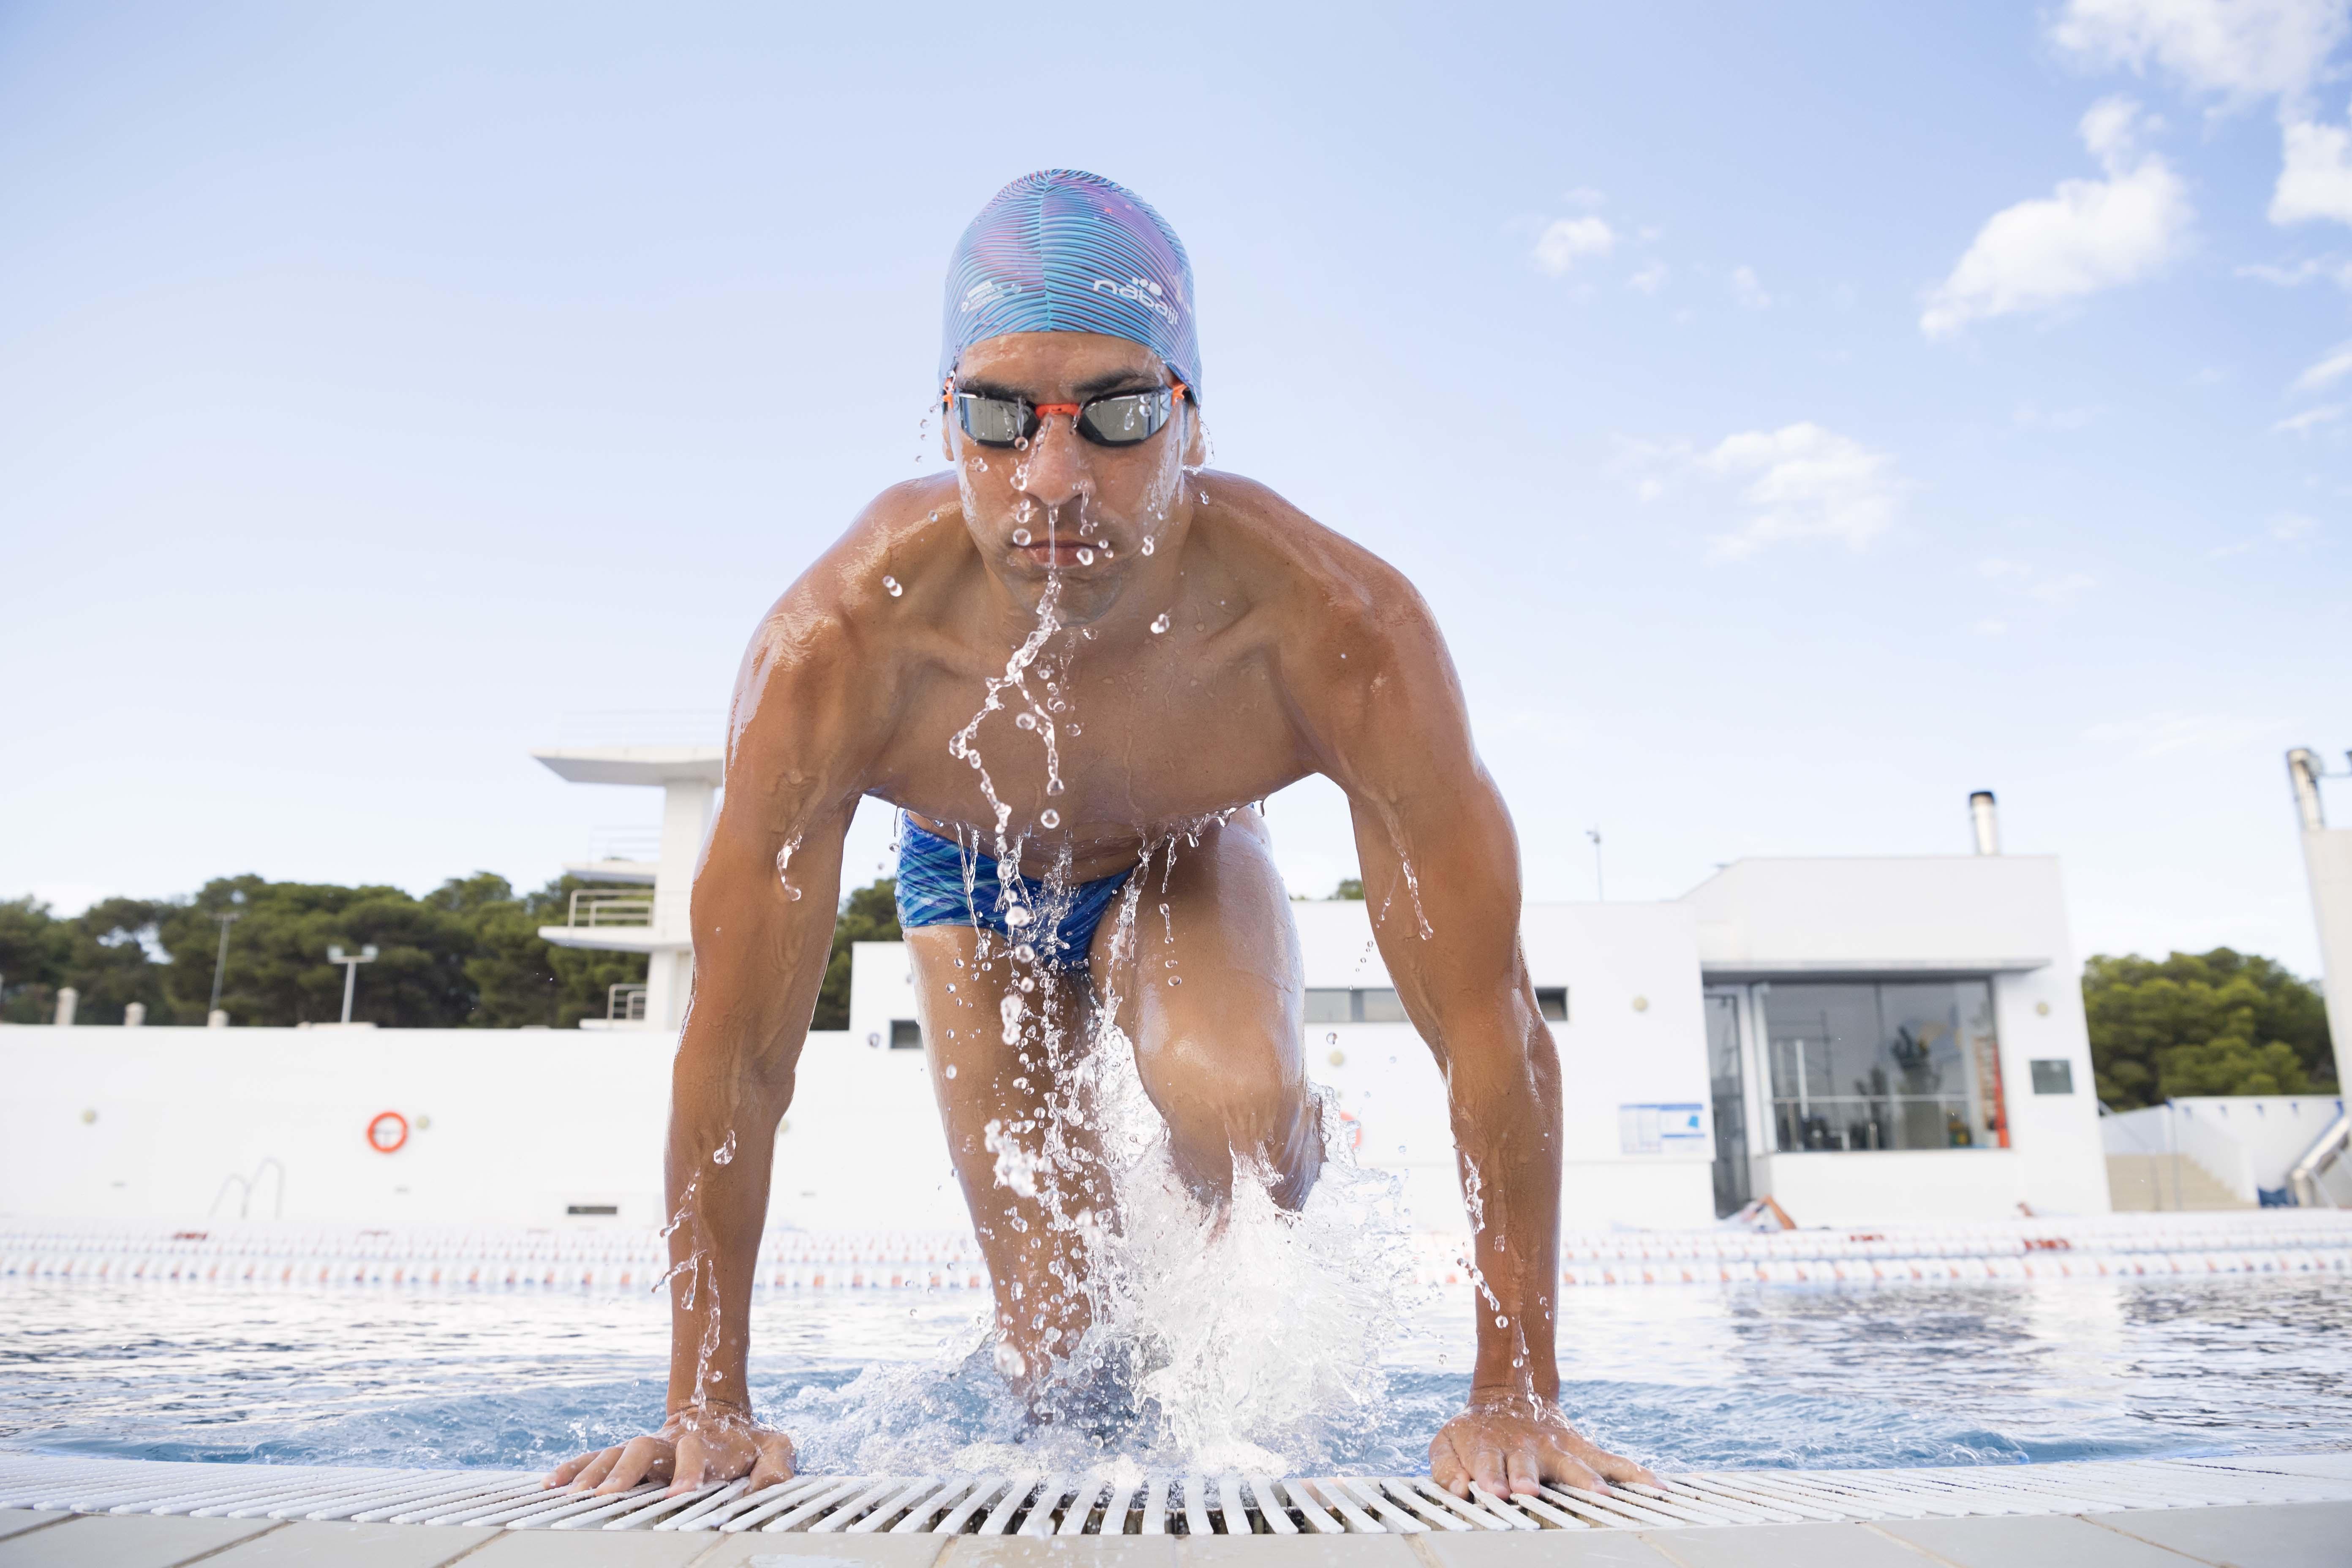 swimming-decathlon-men